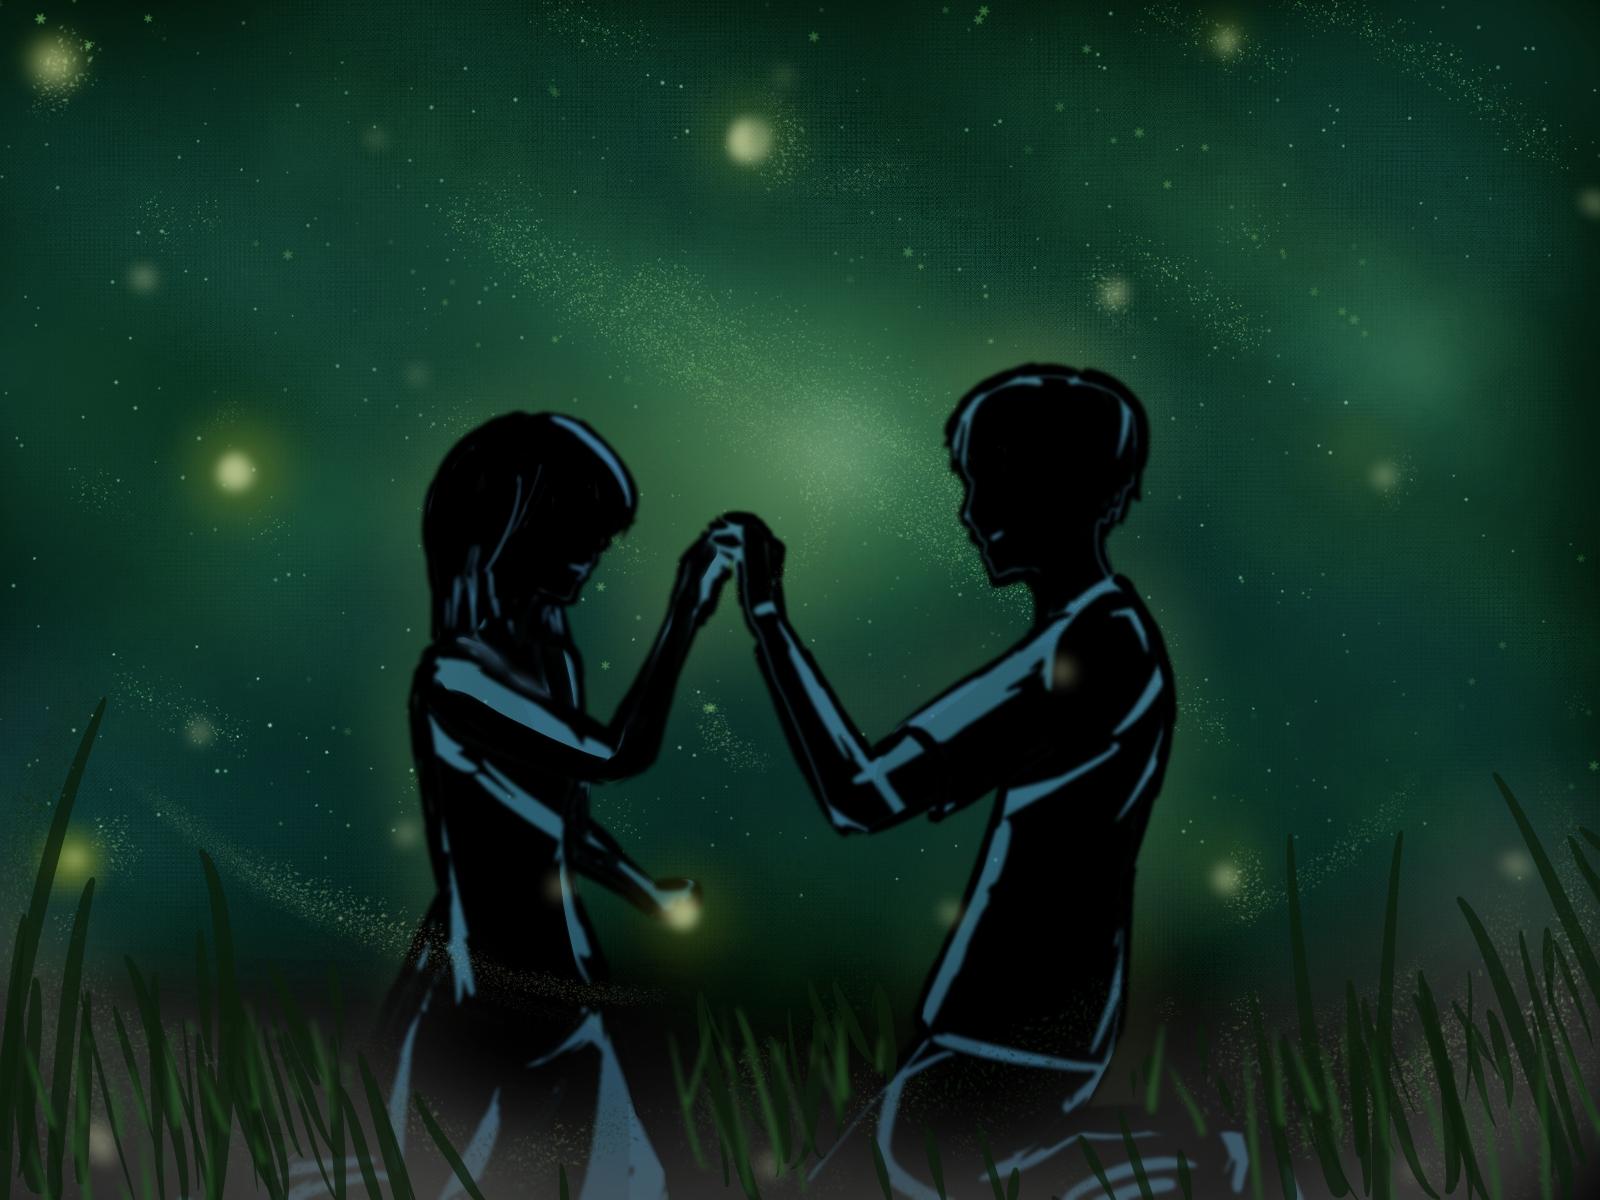 Silhouette by DenAltVega